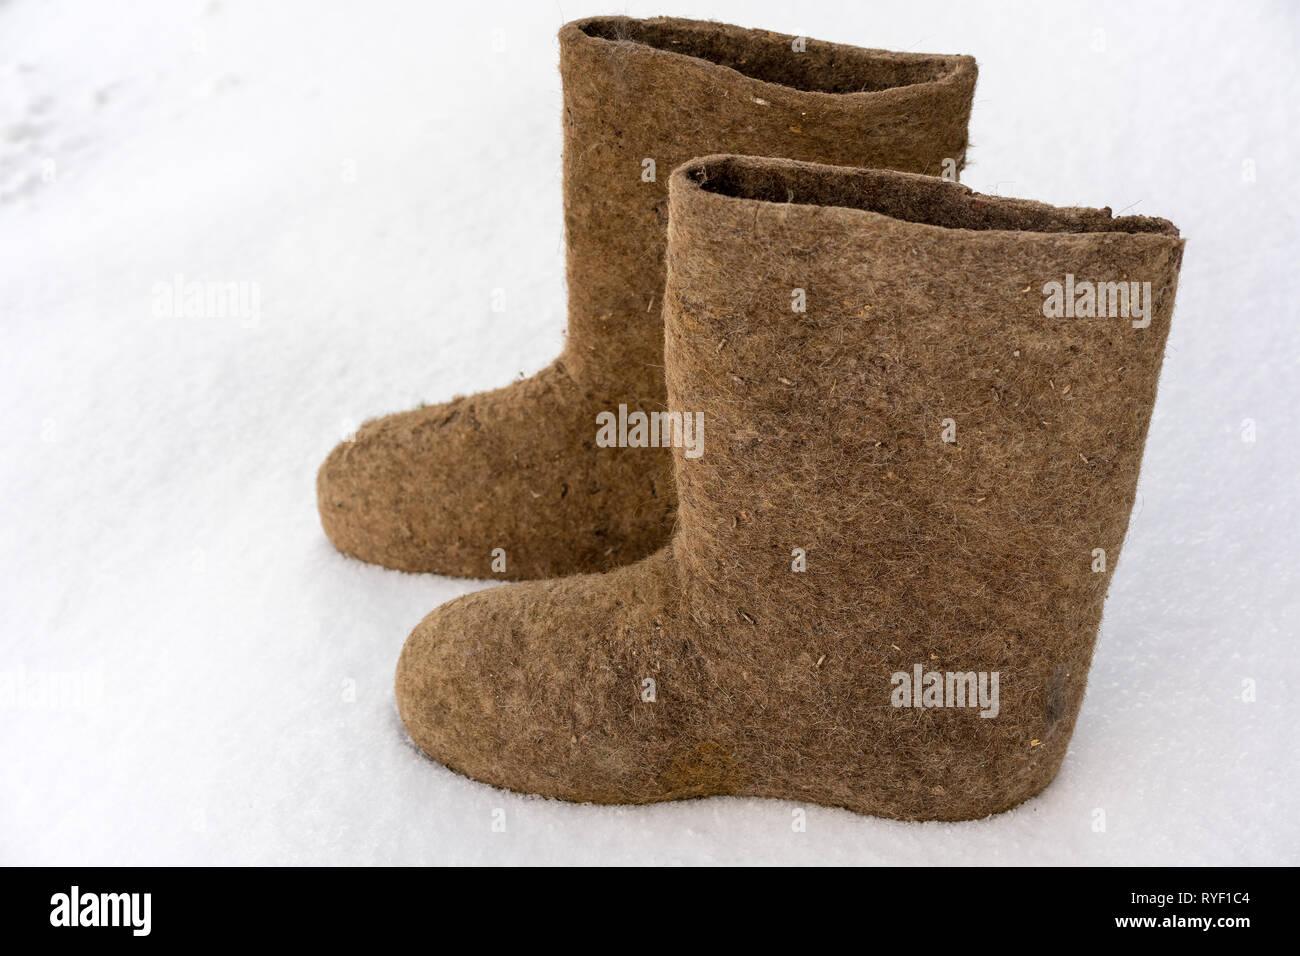 online retailer 2b374 2e633 Alte nationale traditionelle russische Winter schuhe Boot ...